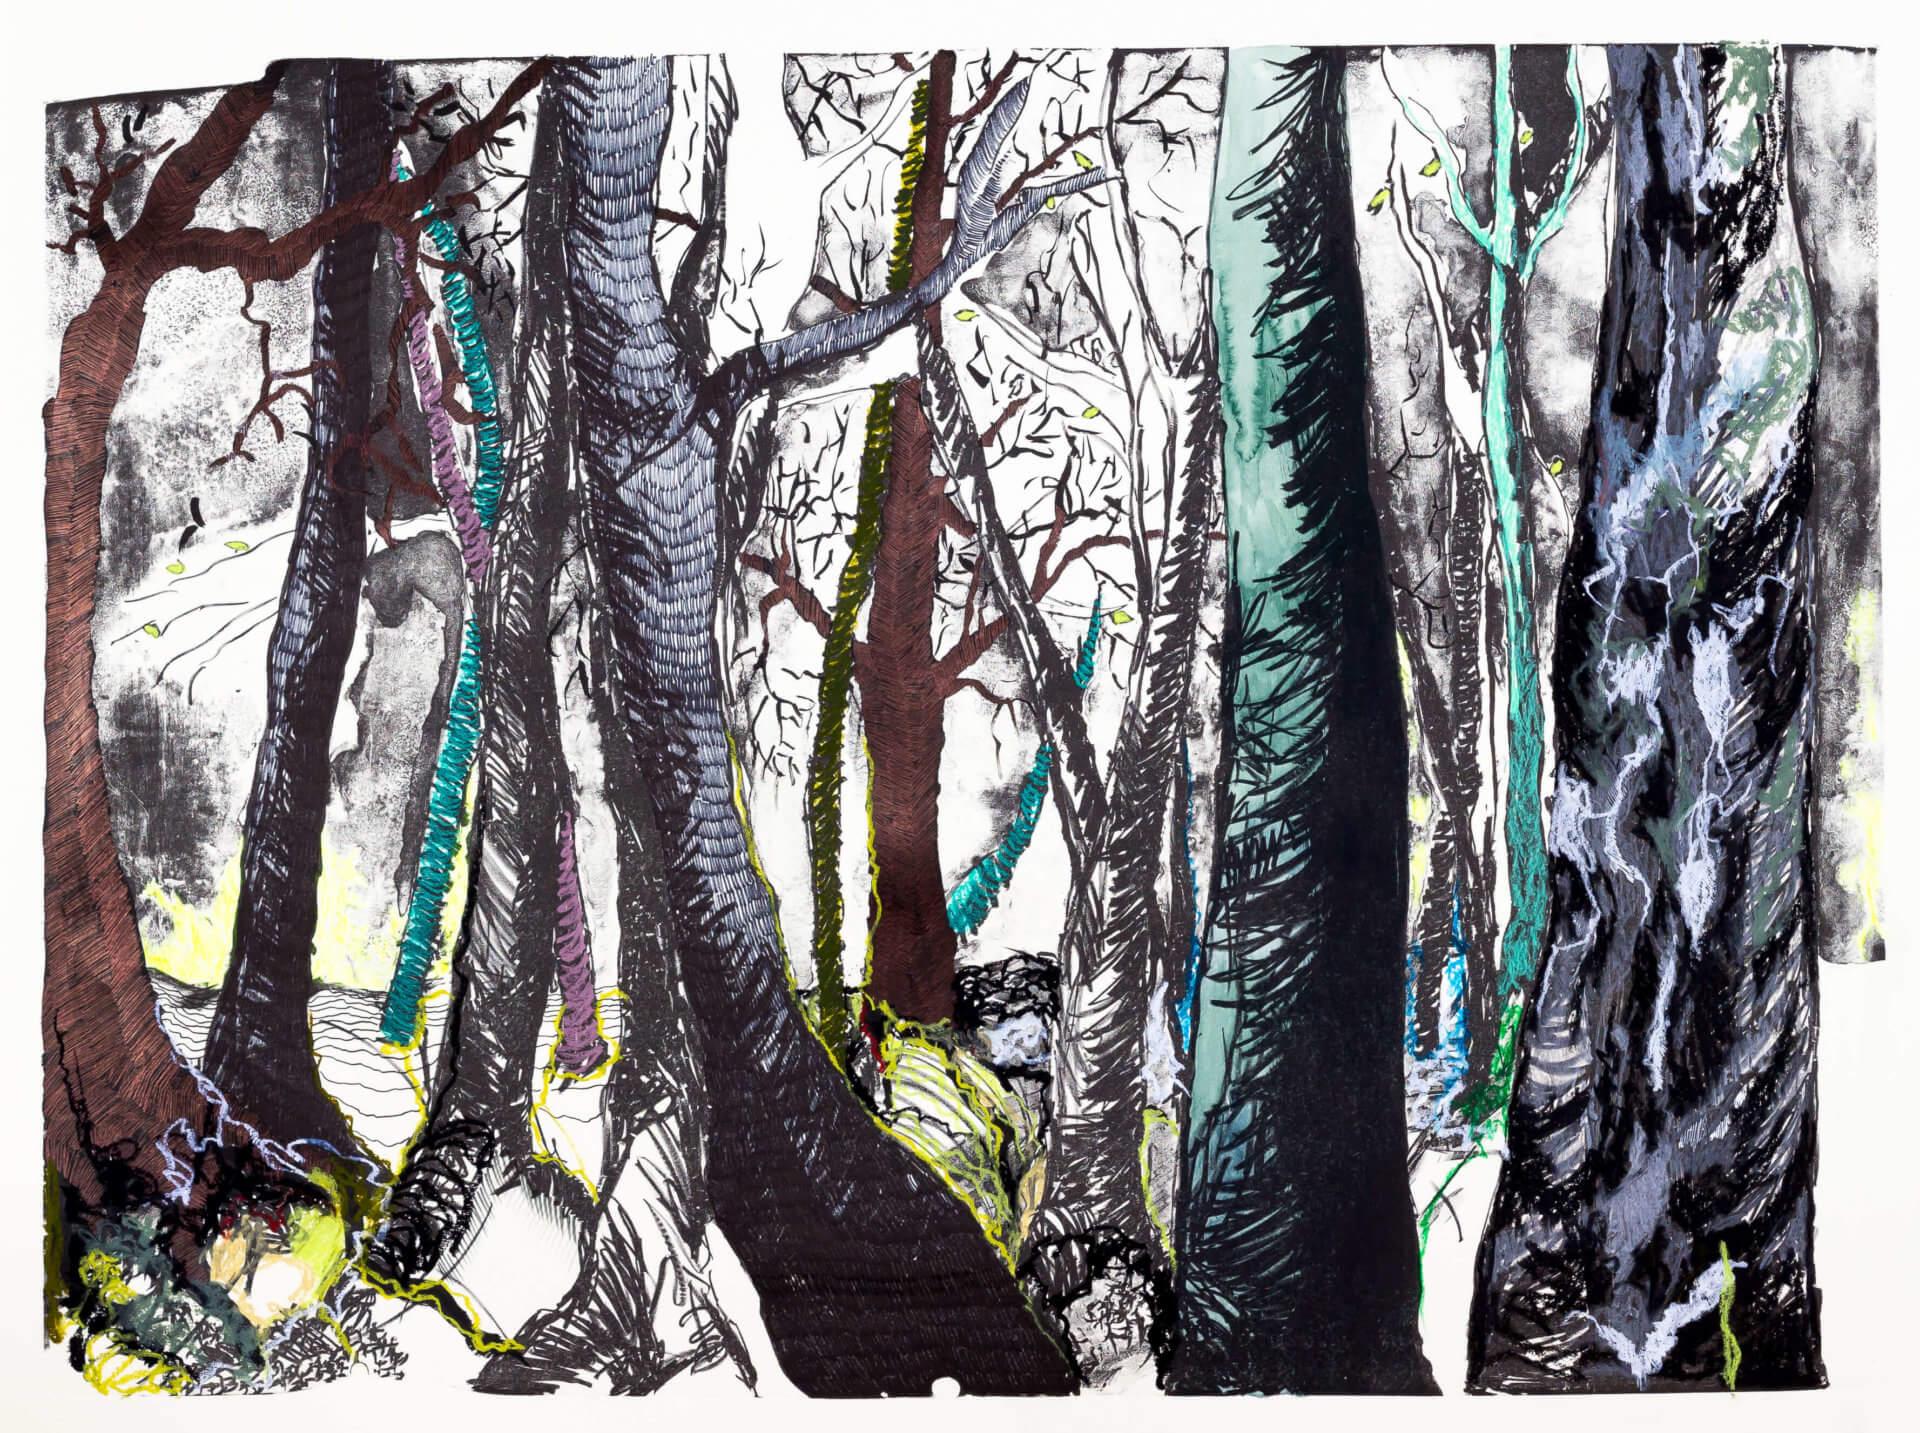 Katharina Albers, Wald (F_B)(D), 2016, Lithographie handkoloriert (Ölkreide, Graphit, Aquarellfarbe, Fineliner, Gelstift, Tusche), Unikat, 70×100 cm